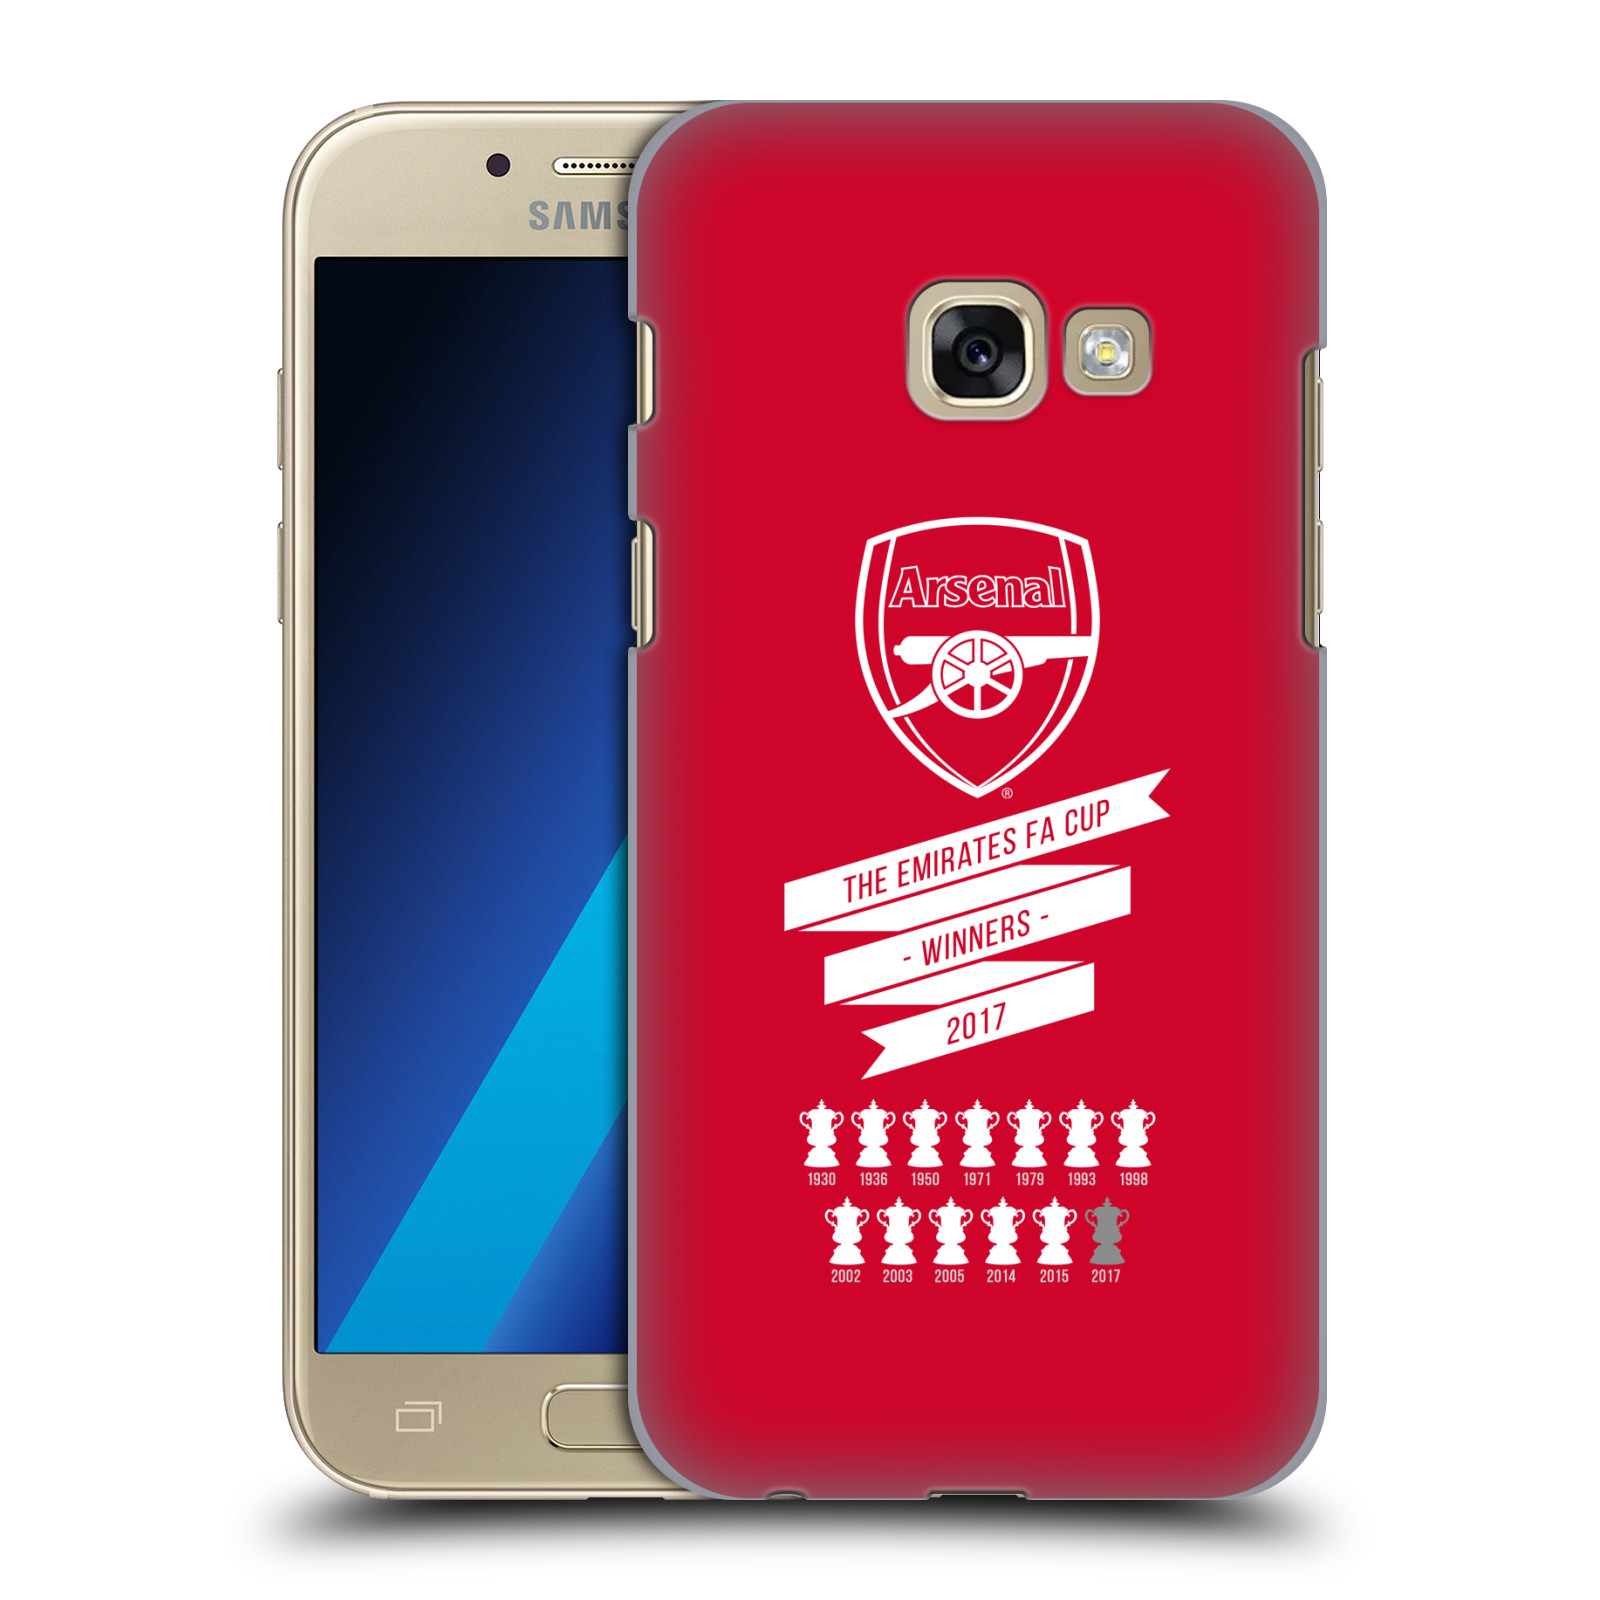 Plastové pouzdro na mobil Samsung Galaxy A3 (2017) - Head Case - Arsenal FC - 13 Wins